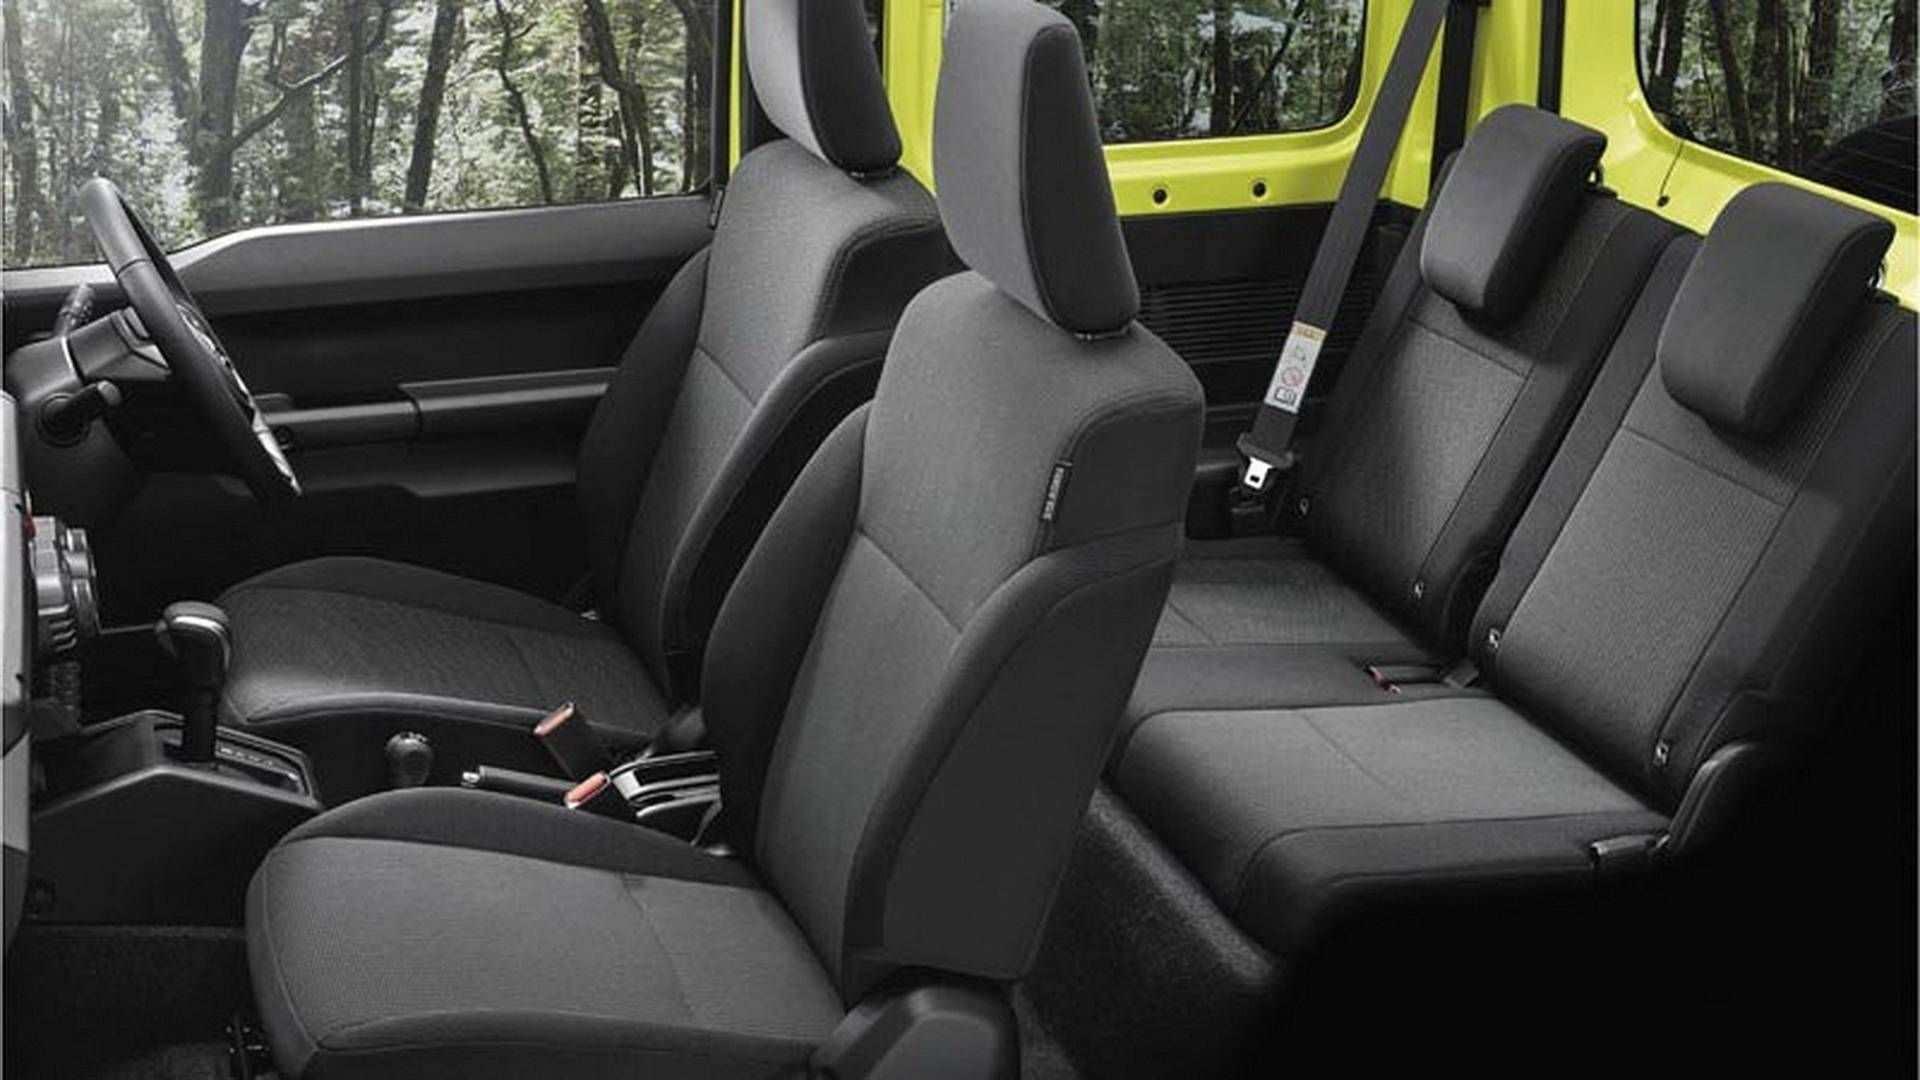 46 New Suzuki Jimny Interior Prices for Suzuki Jimny Interior